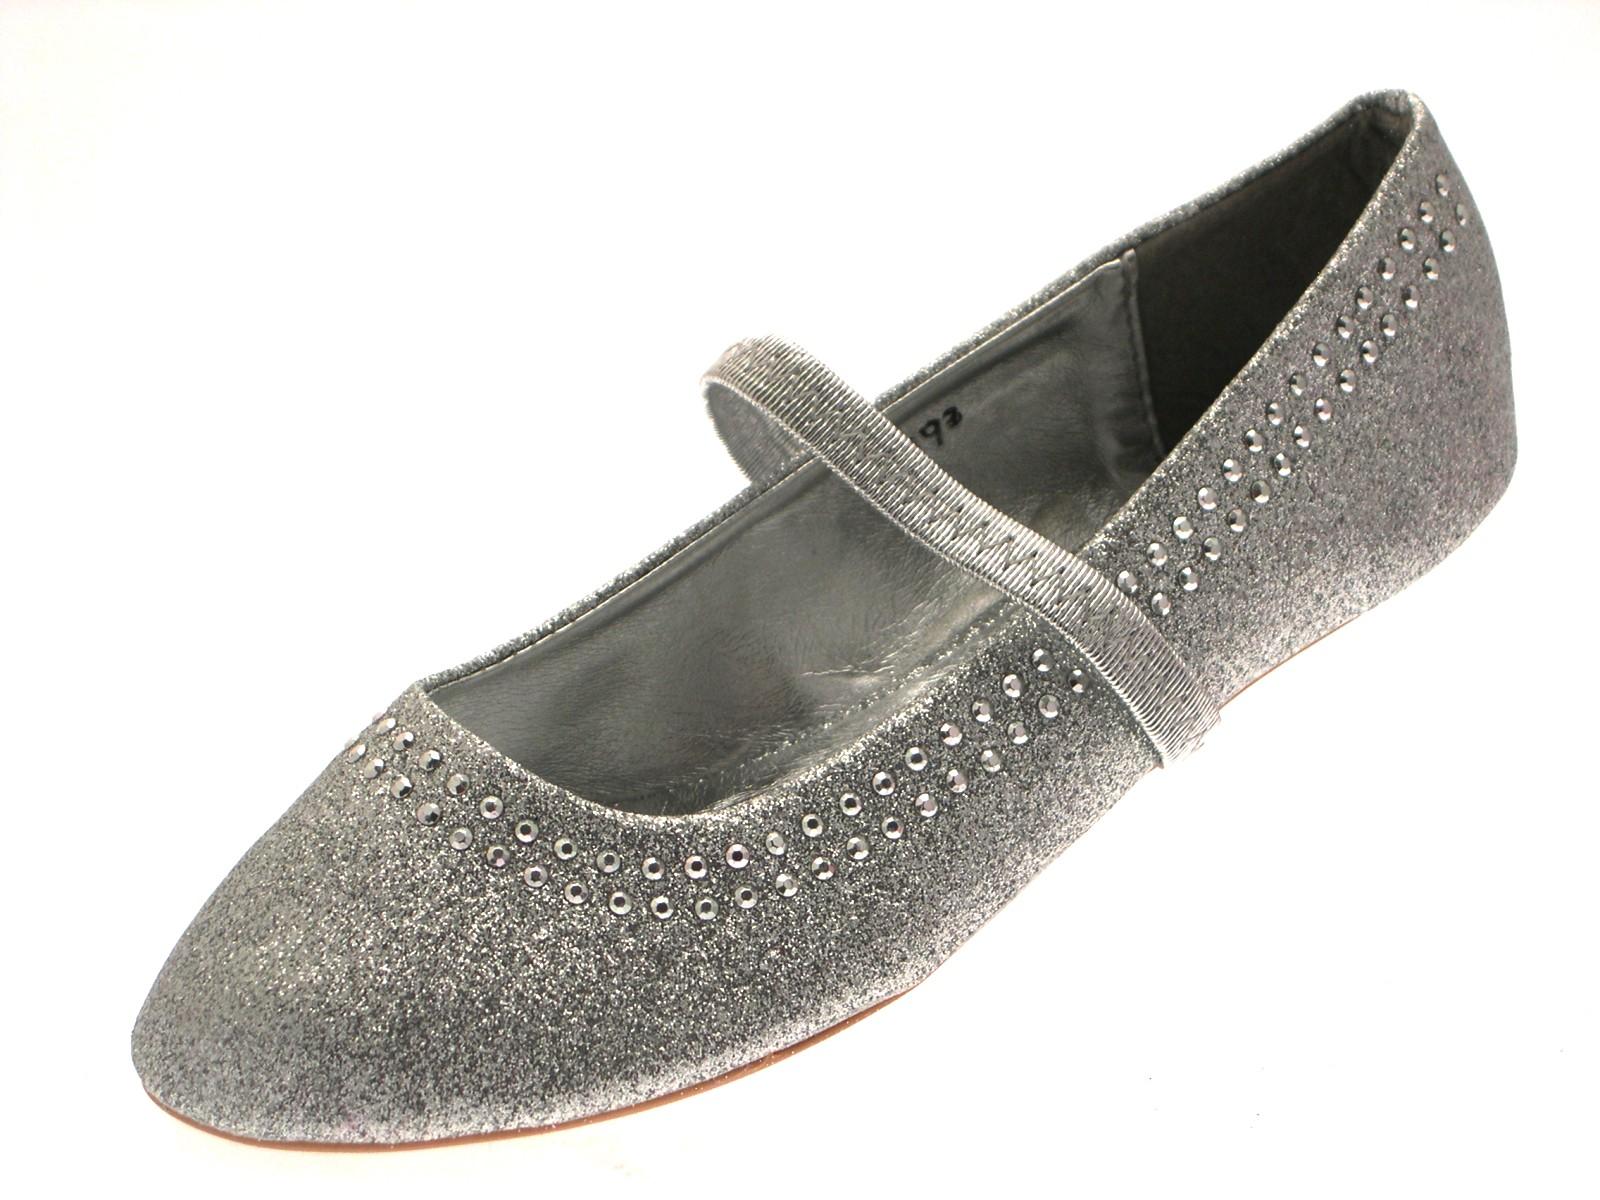 Niños Niñas Mary Janes Ballet Bombas Tachonado Brillo Fiesta Zapatos PLANOS SIZE UK 9-2